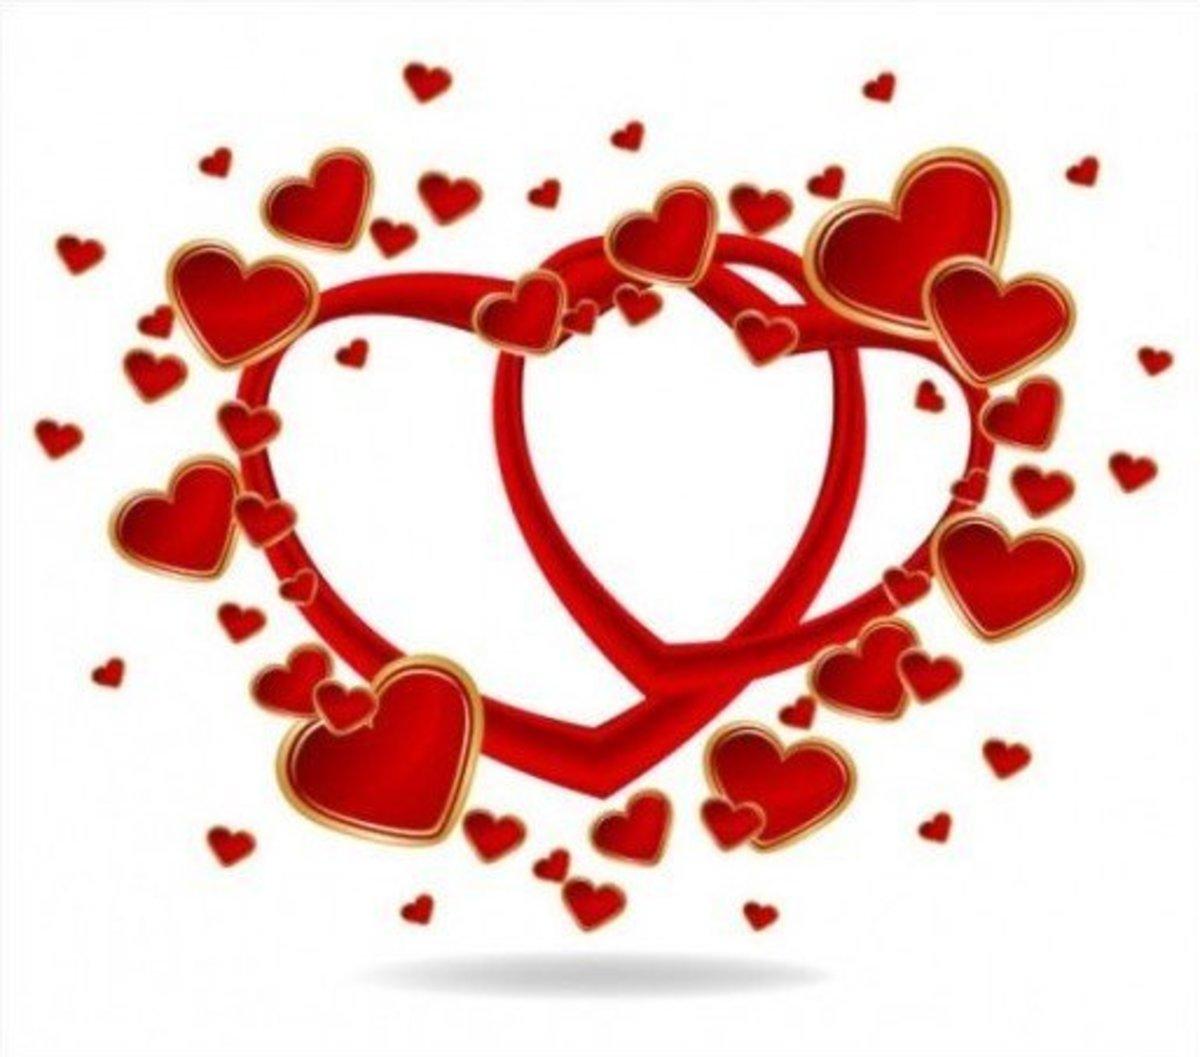 Interlocking Red Hearts Picture